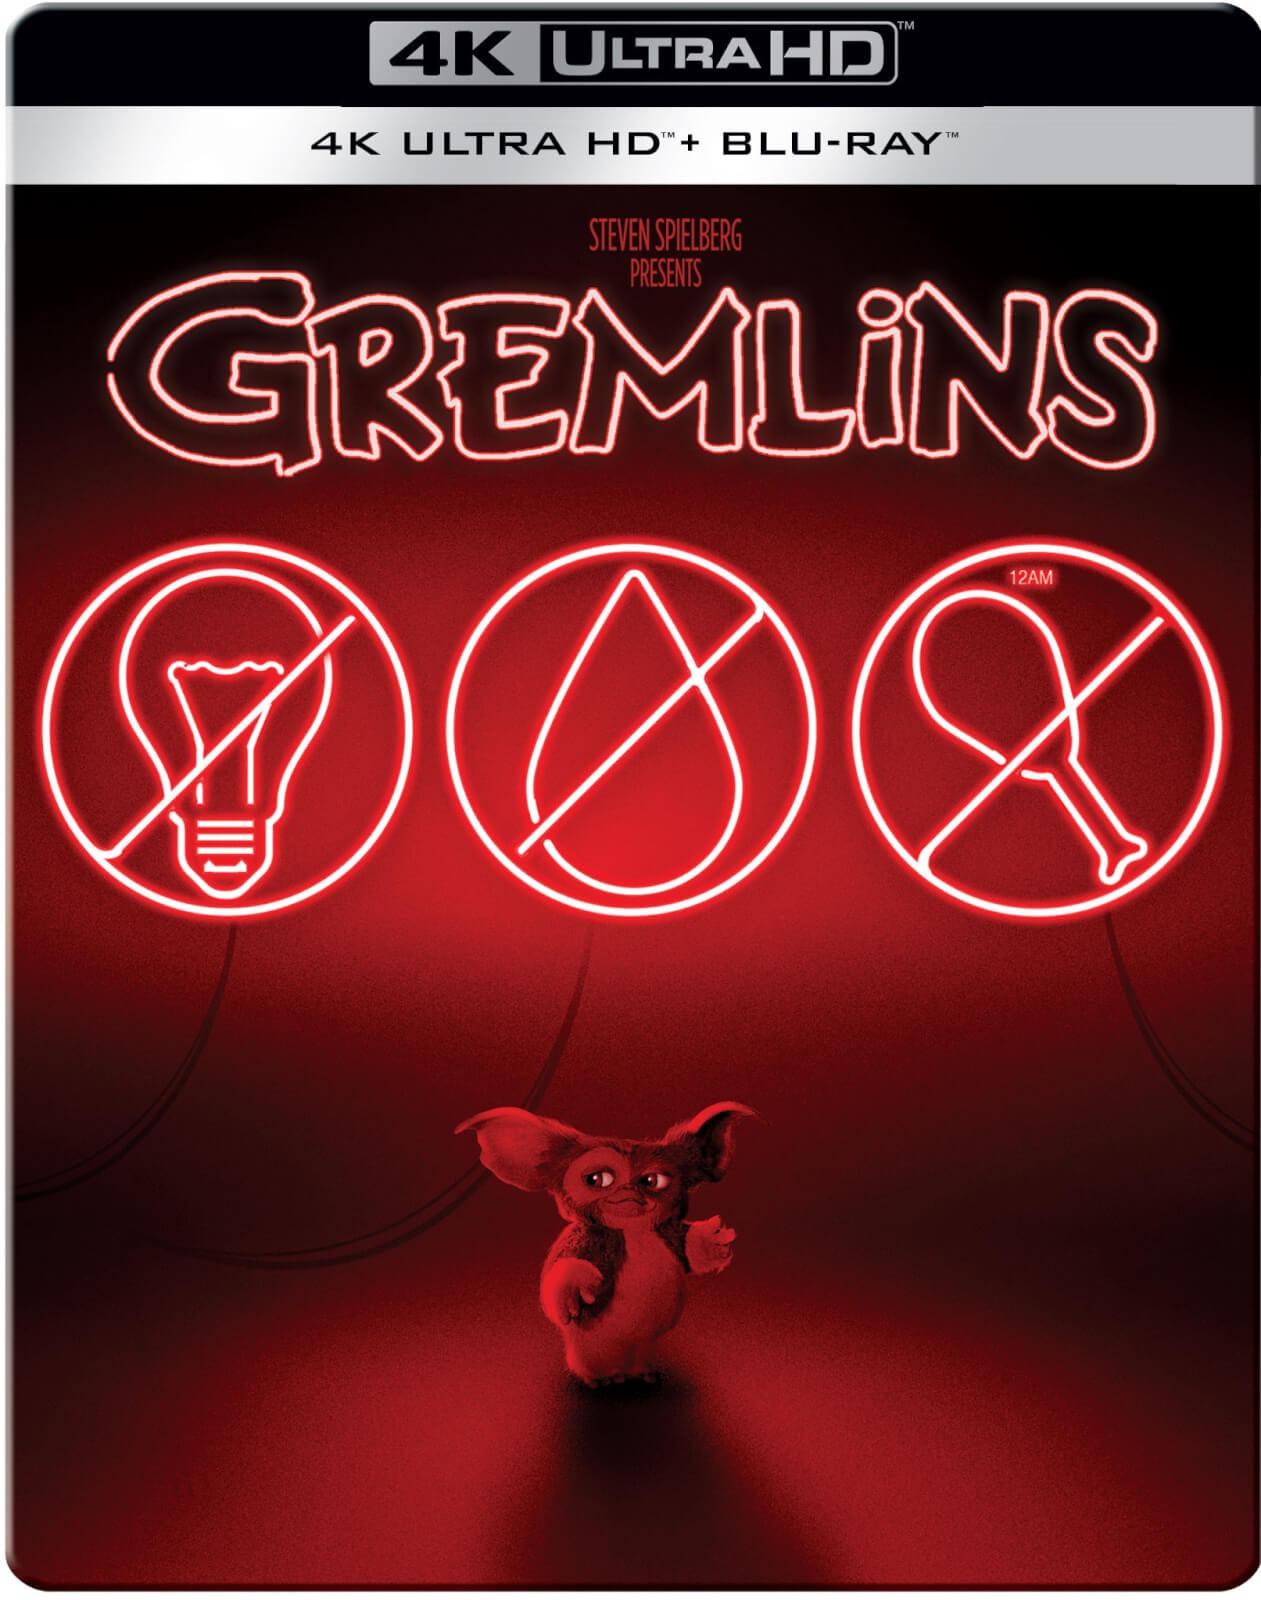 Gremlins - 4K Ultra HD (Includes 2D Blu-ray) Zavvi Exclusive Steelbook - Preorder £24.99 @ Zavvi